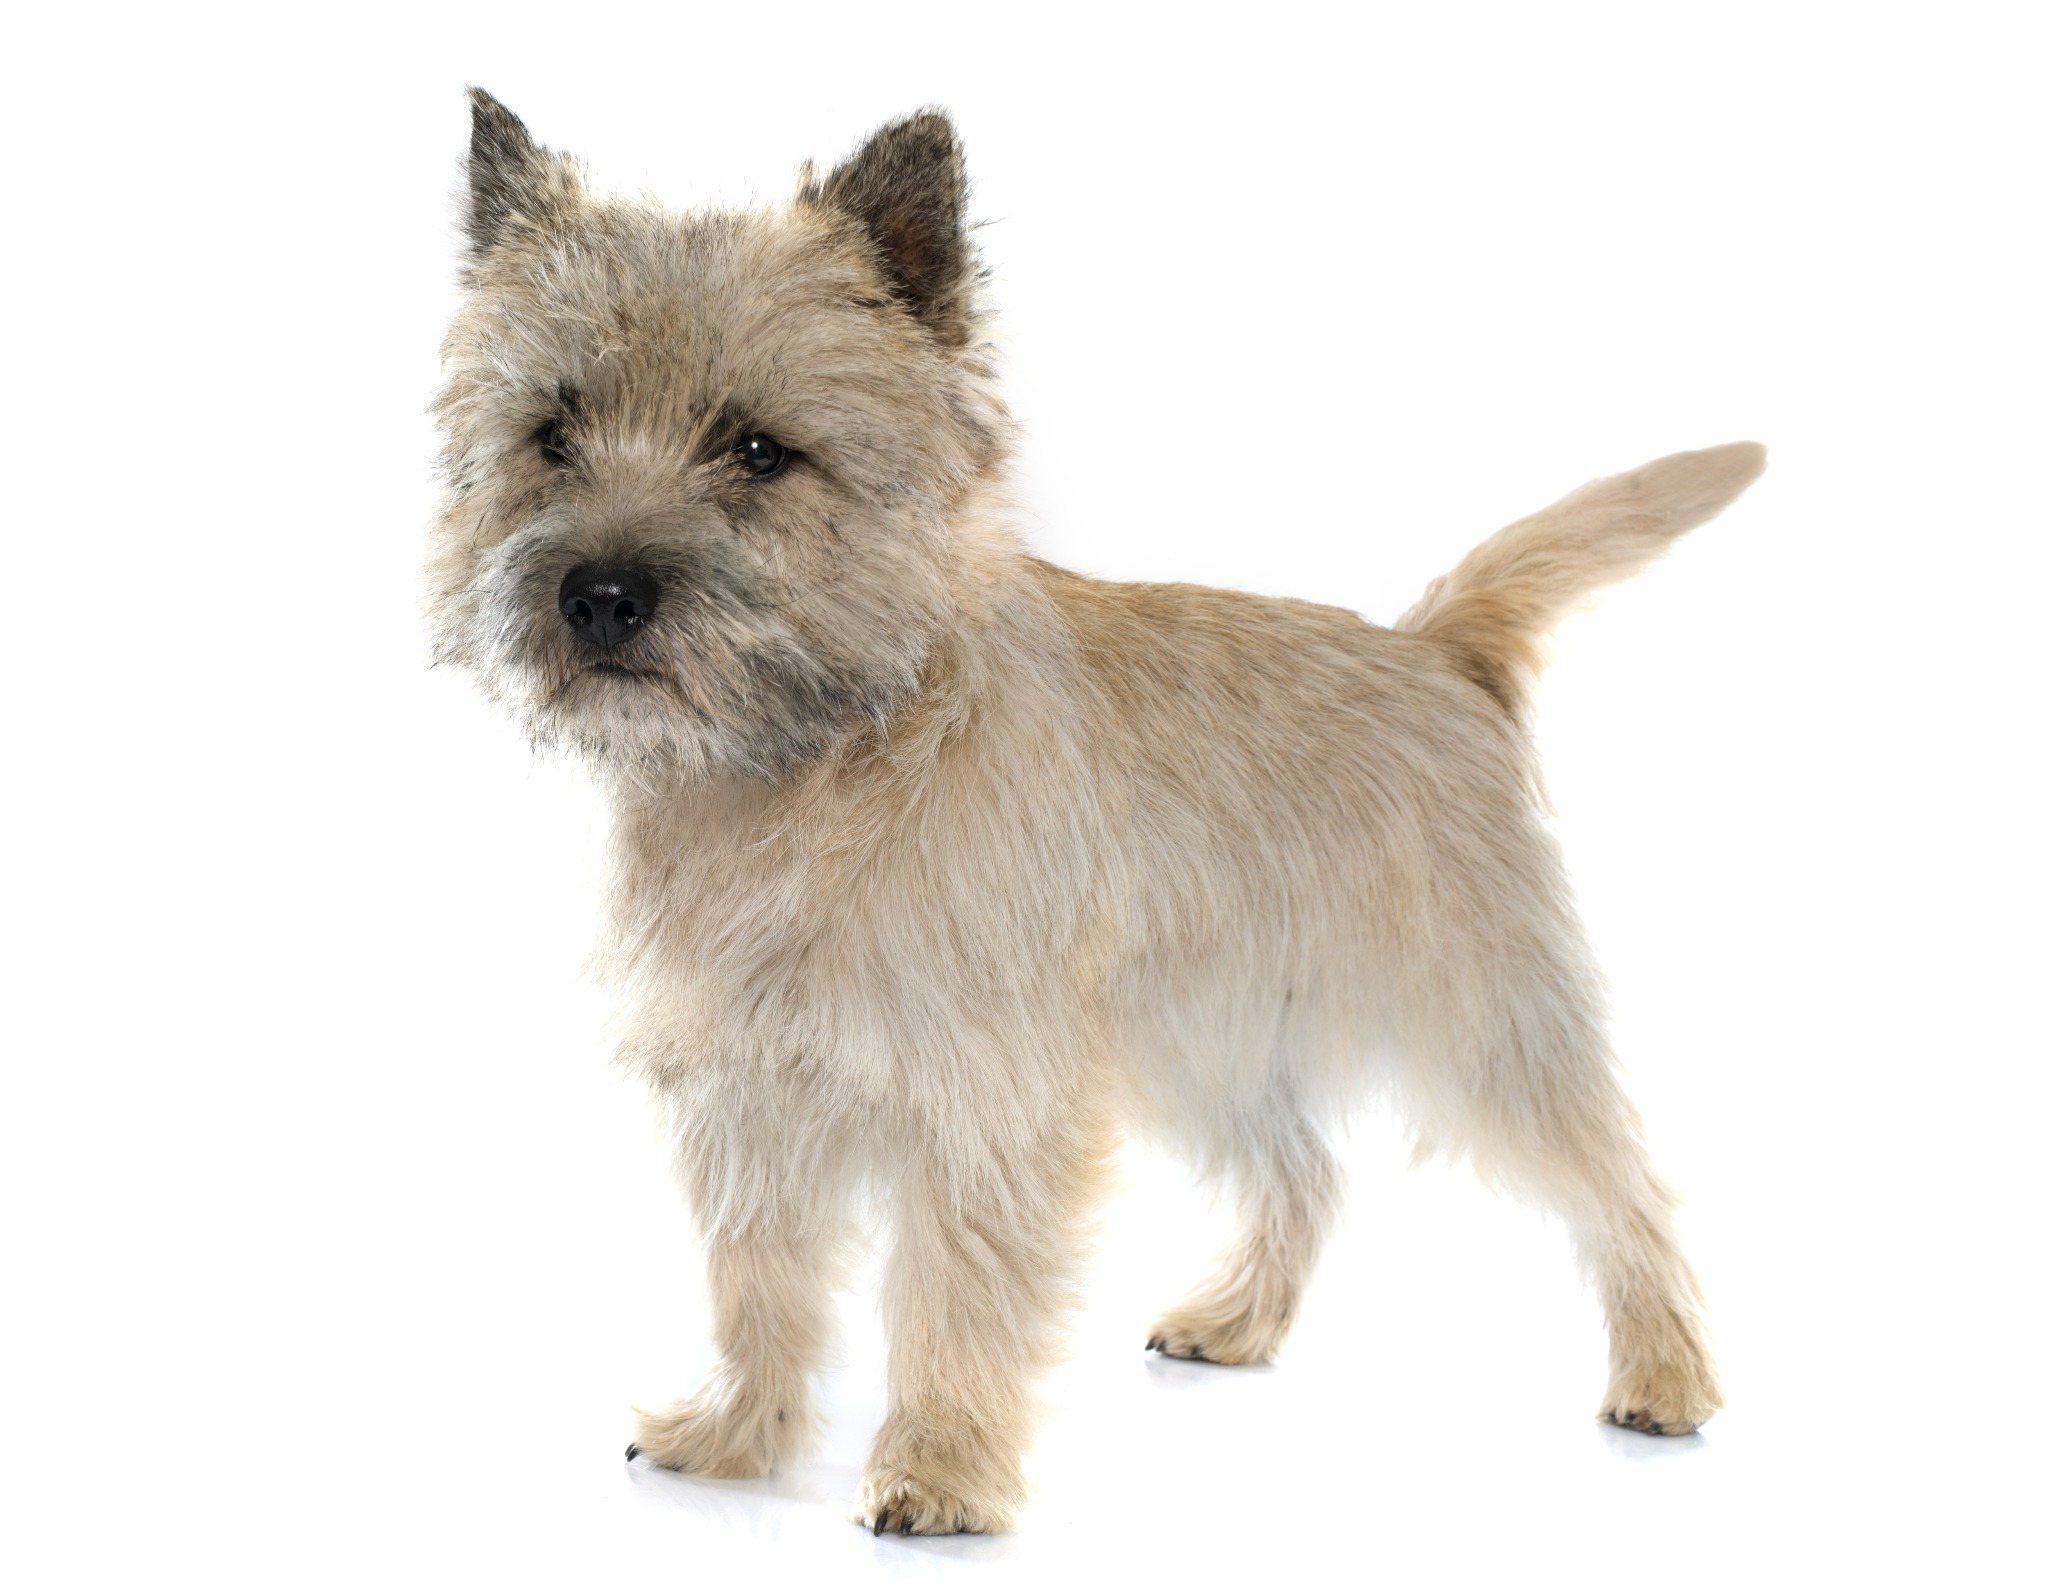 A portrait of a Cairn Terrier